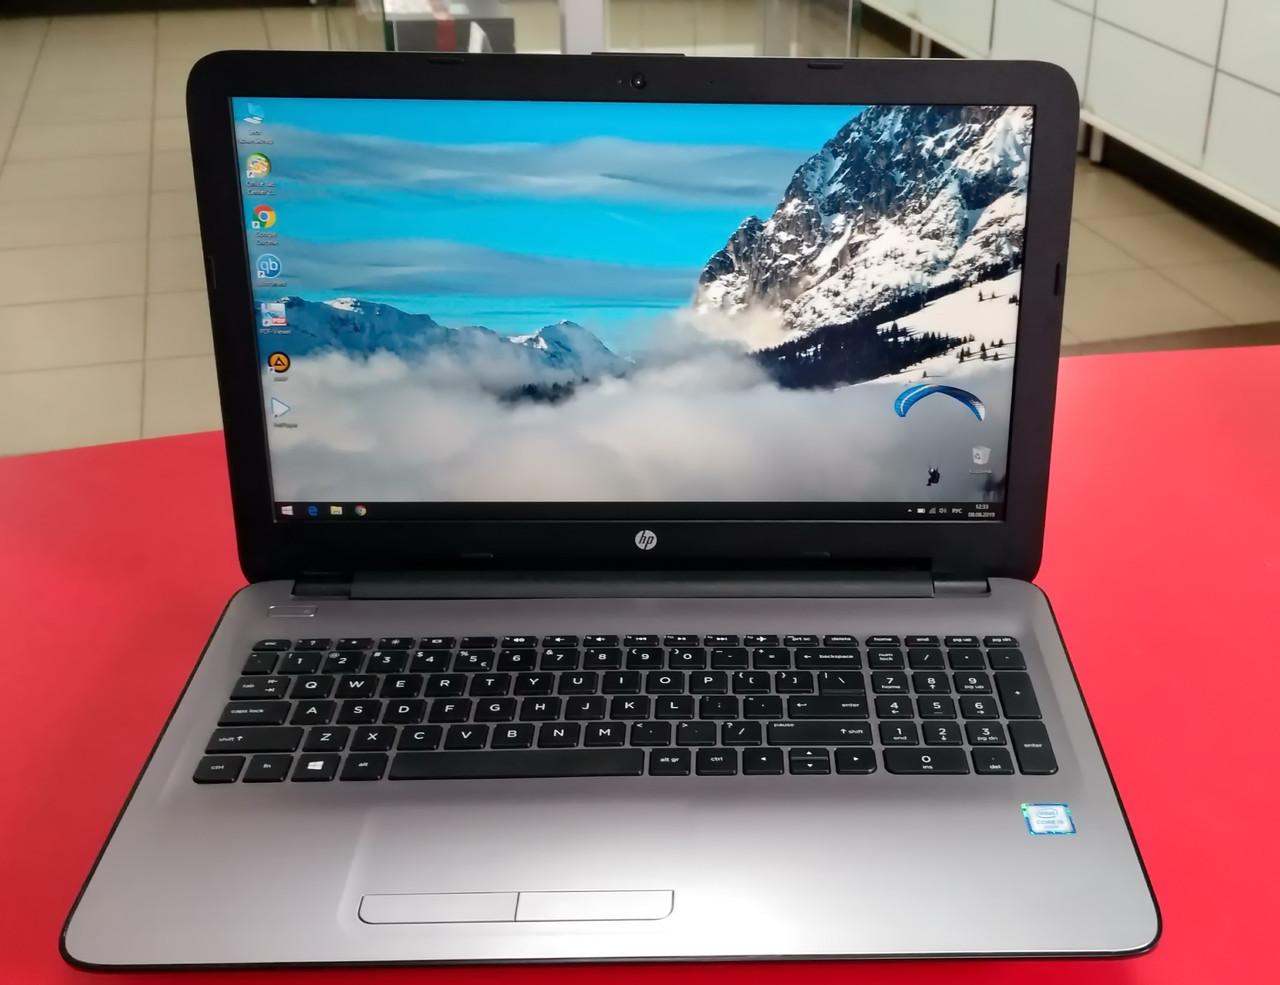 "Ноутбук HP 250 G5 15.6"" Intel Core i5 2.3 GHz 4 GB RAM 240 GB SSD Silver Б/У"